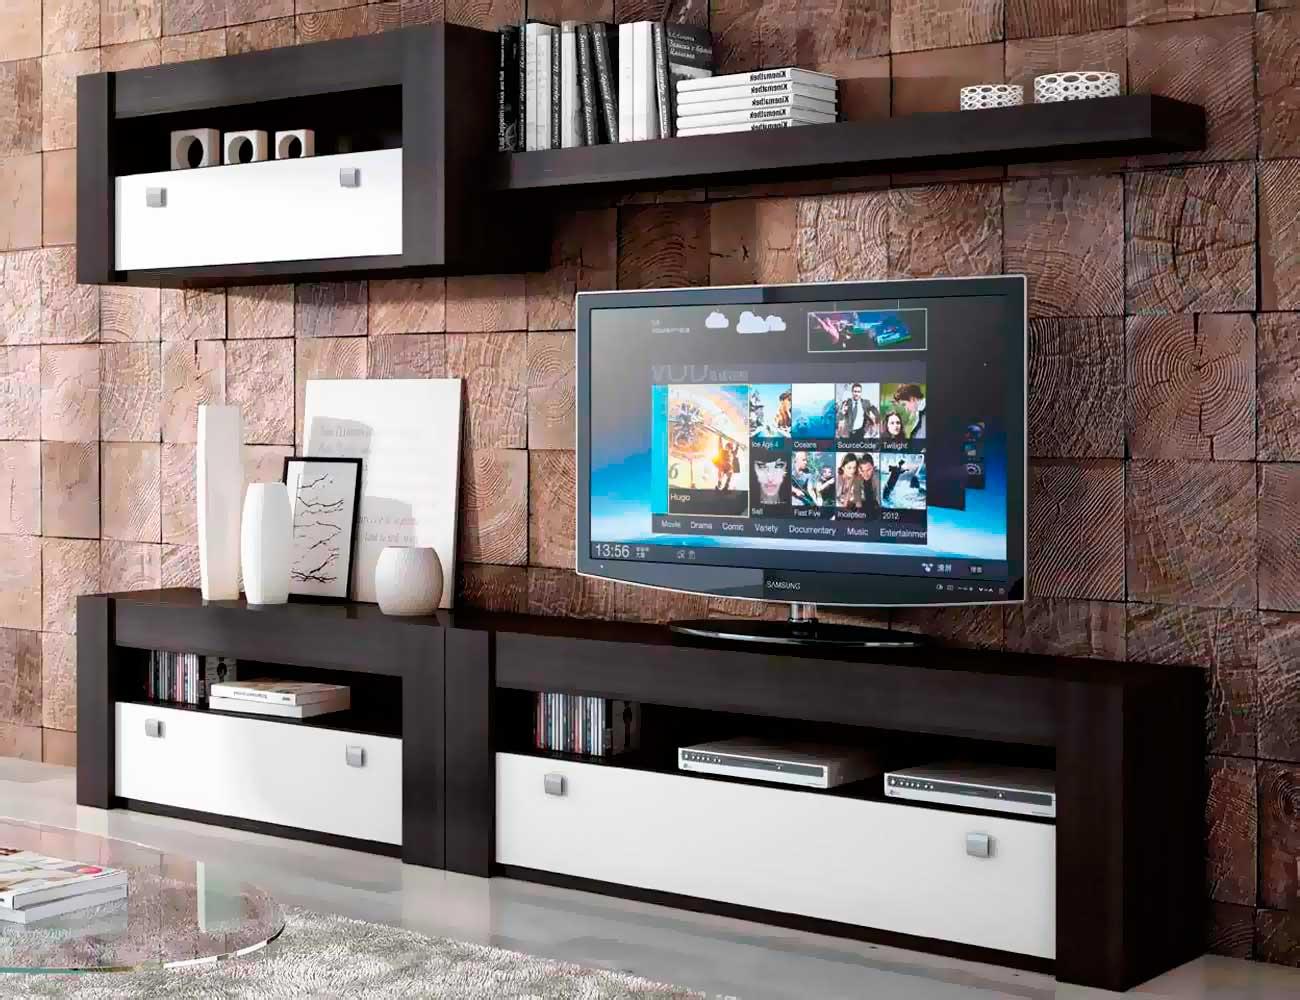 Mueble salon moderno comp01c1